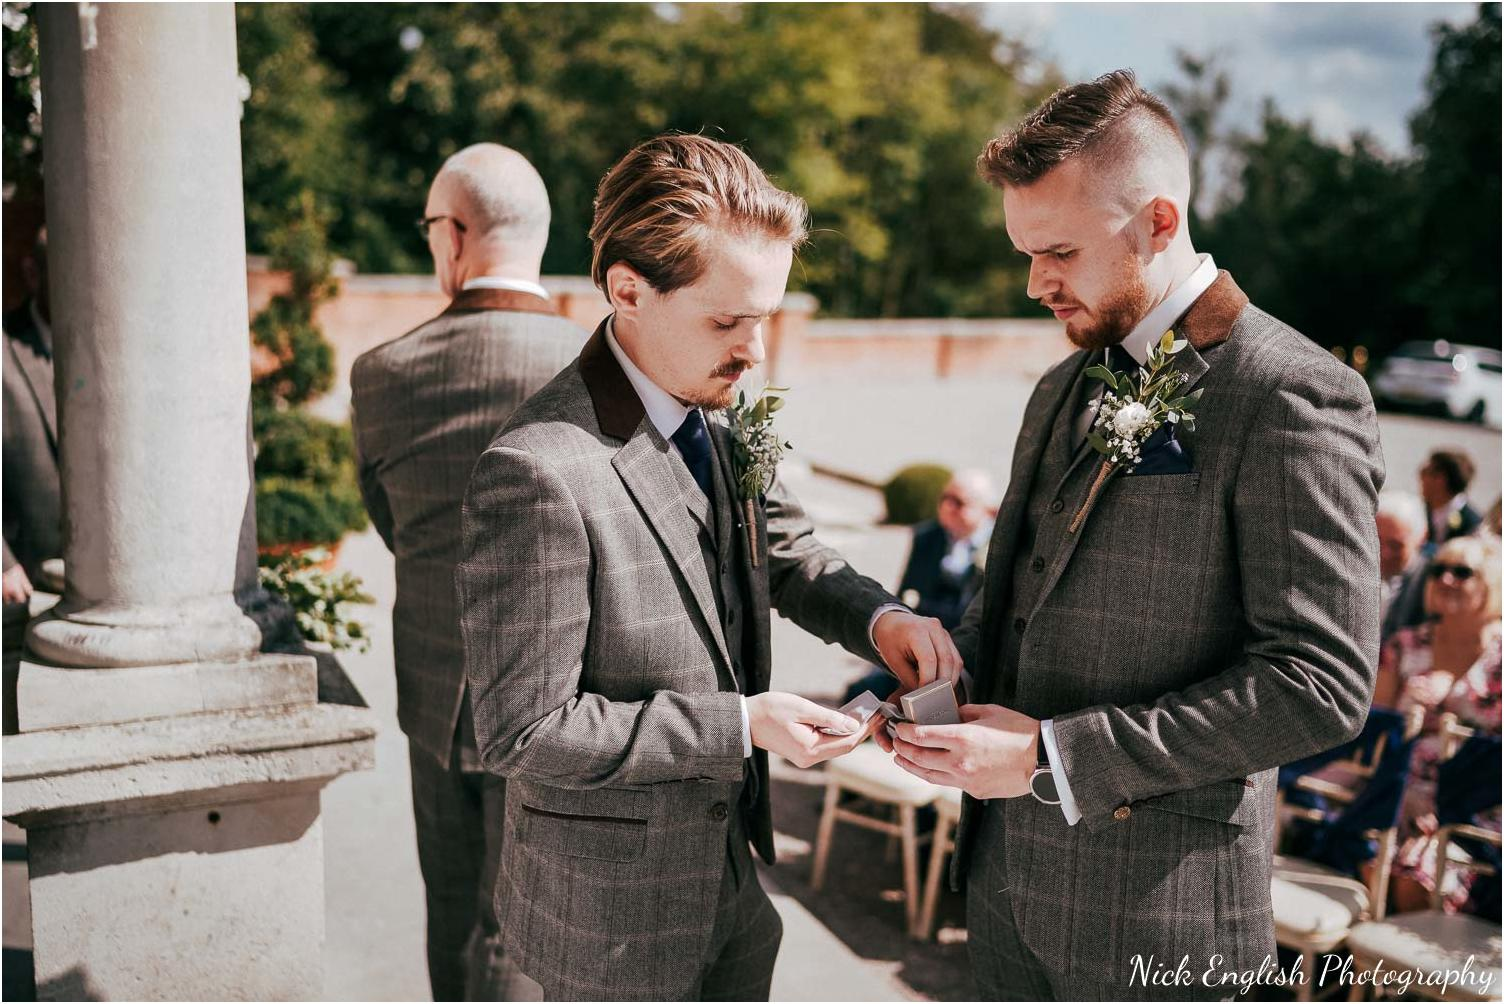 Eaves_Hall_Outdoor_Wedding_Photograph-26.jpg